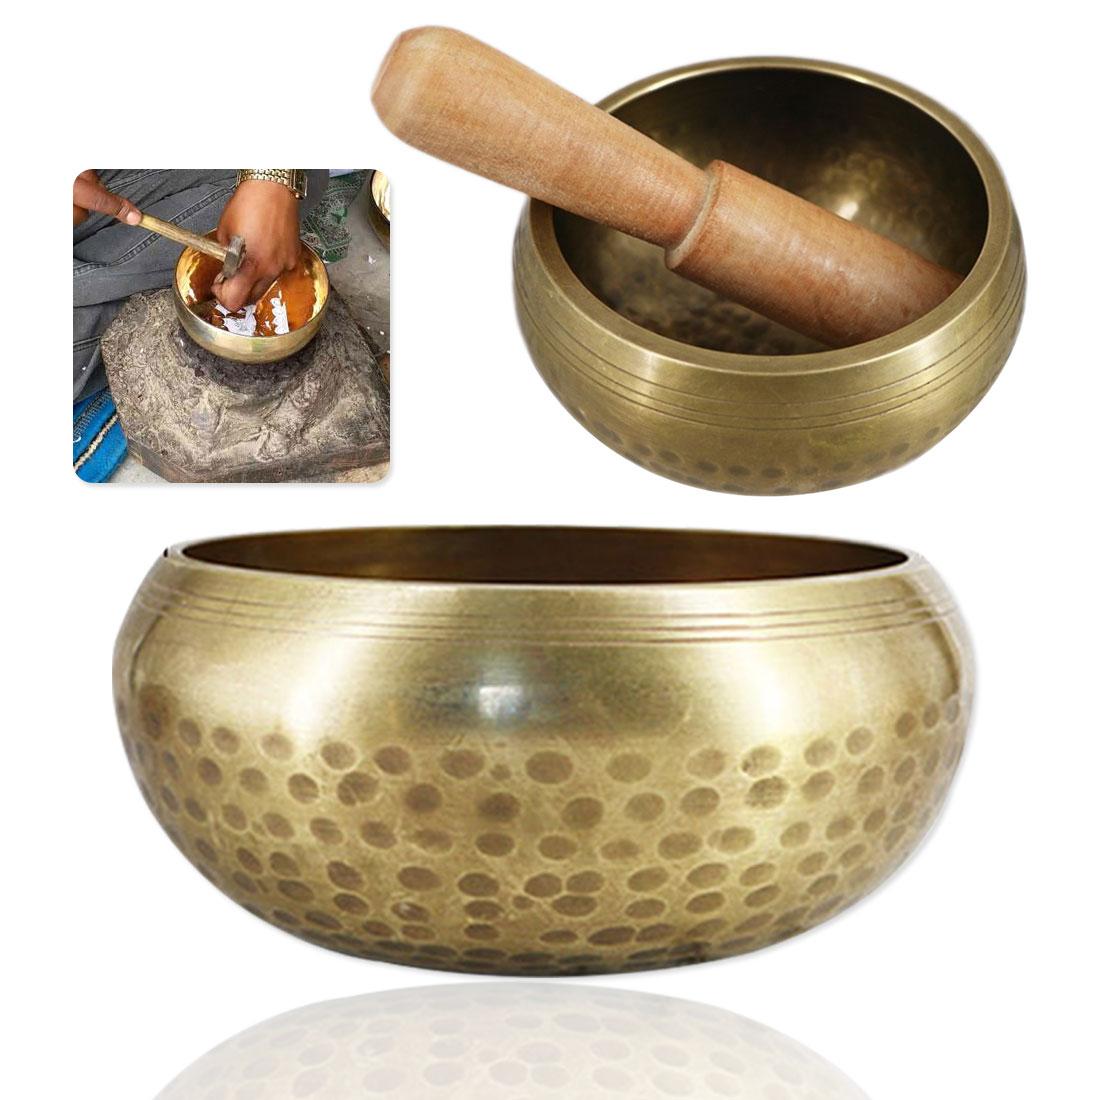 Tibetan Bowl Copper Buddhism Singing Bowls Handmade Decorative-wall-dishes For Meditation Yoga Buddhism Gifts Home Decor Crafts